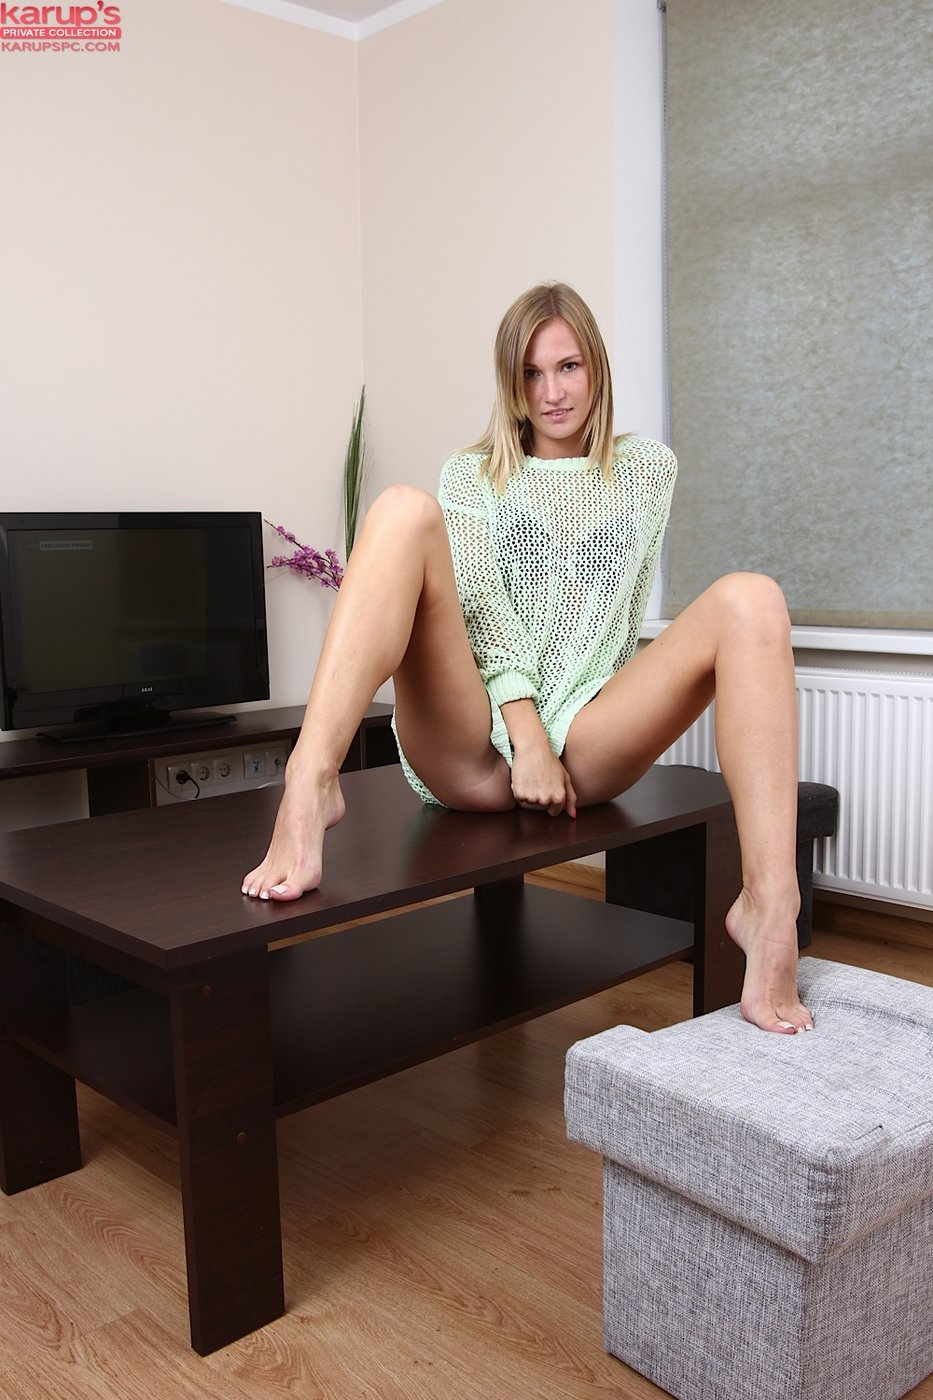 Blonde Short Hair Small Tits